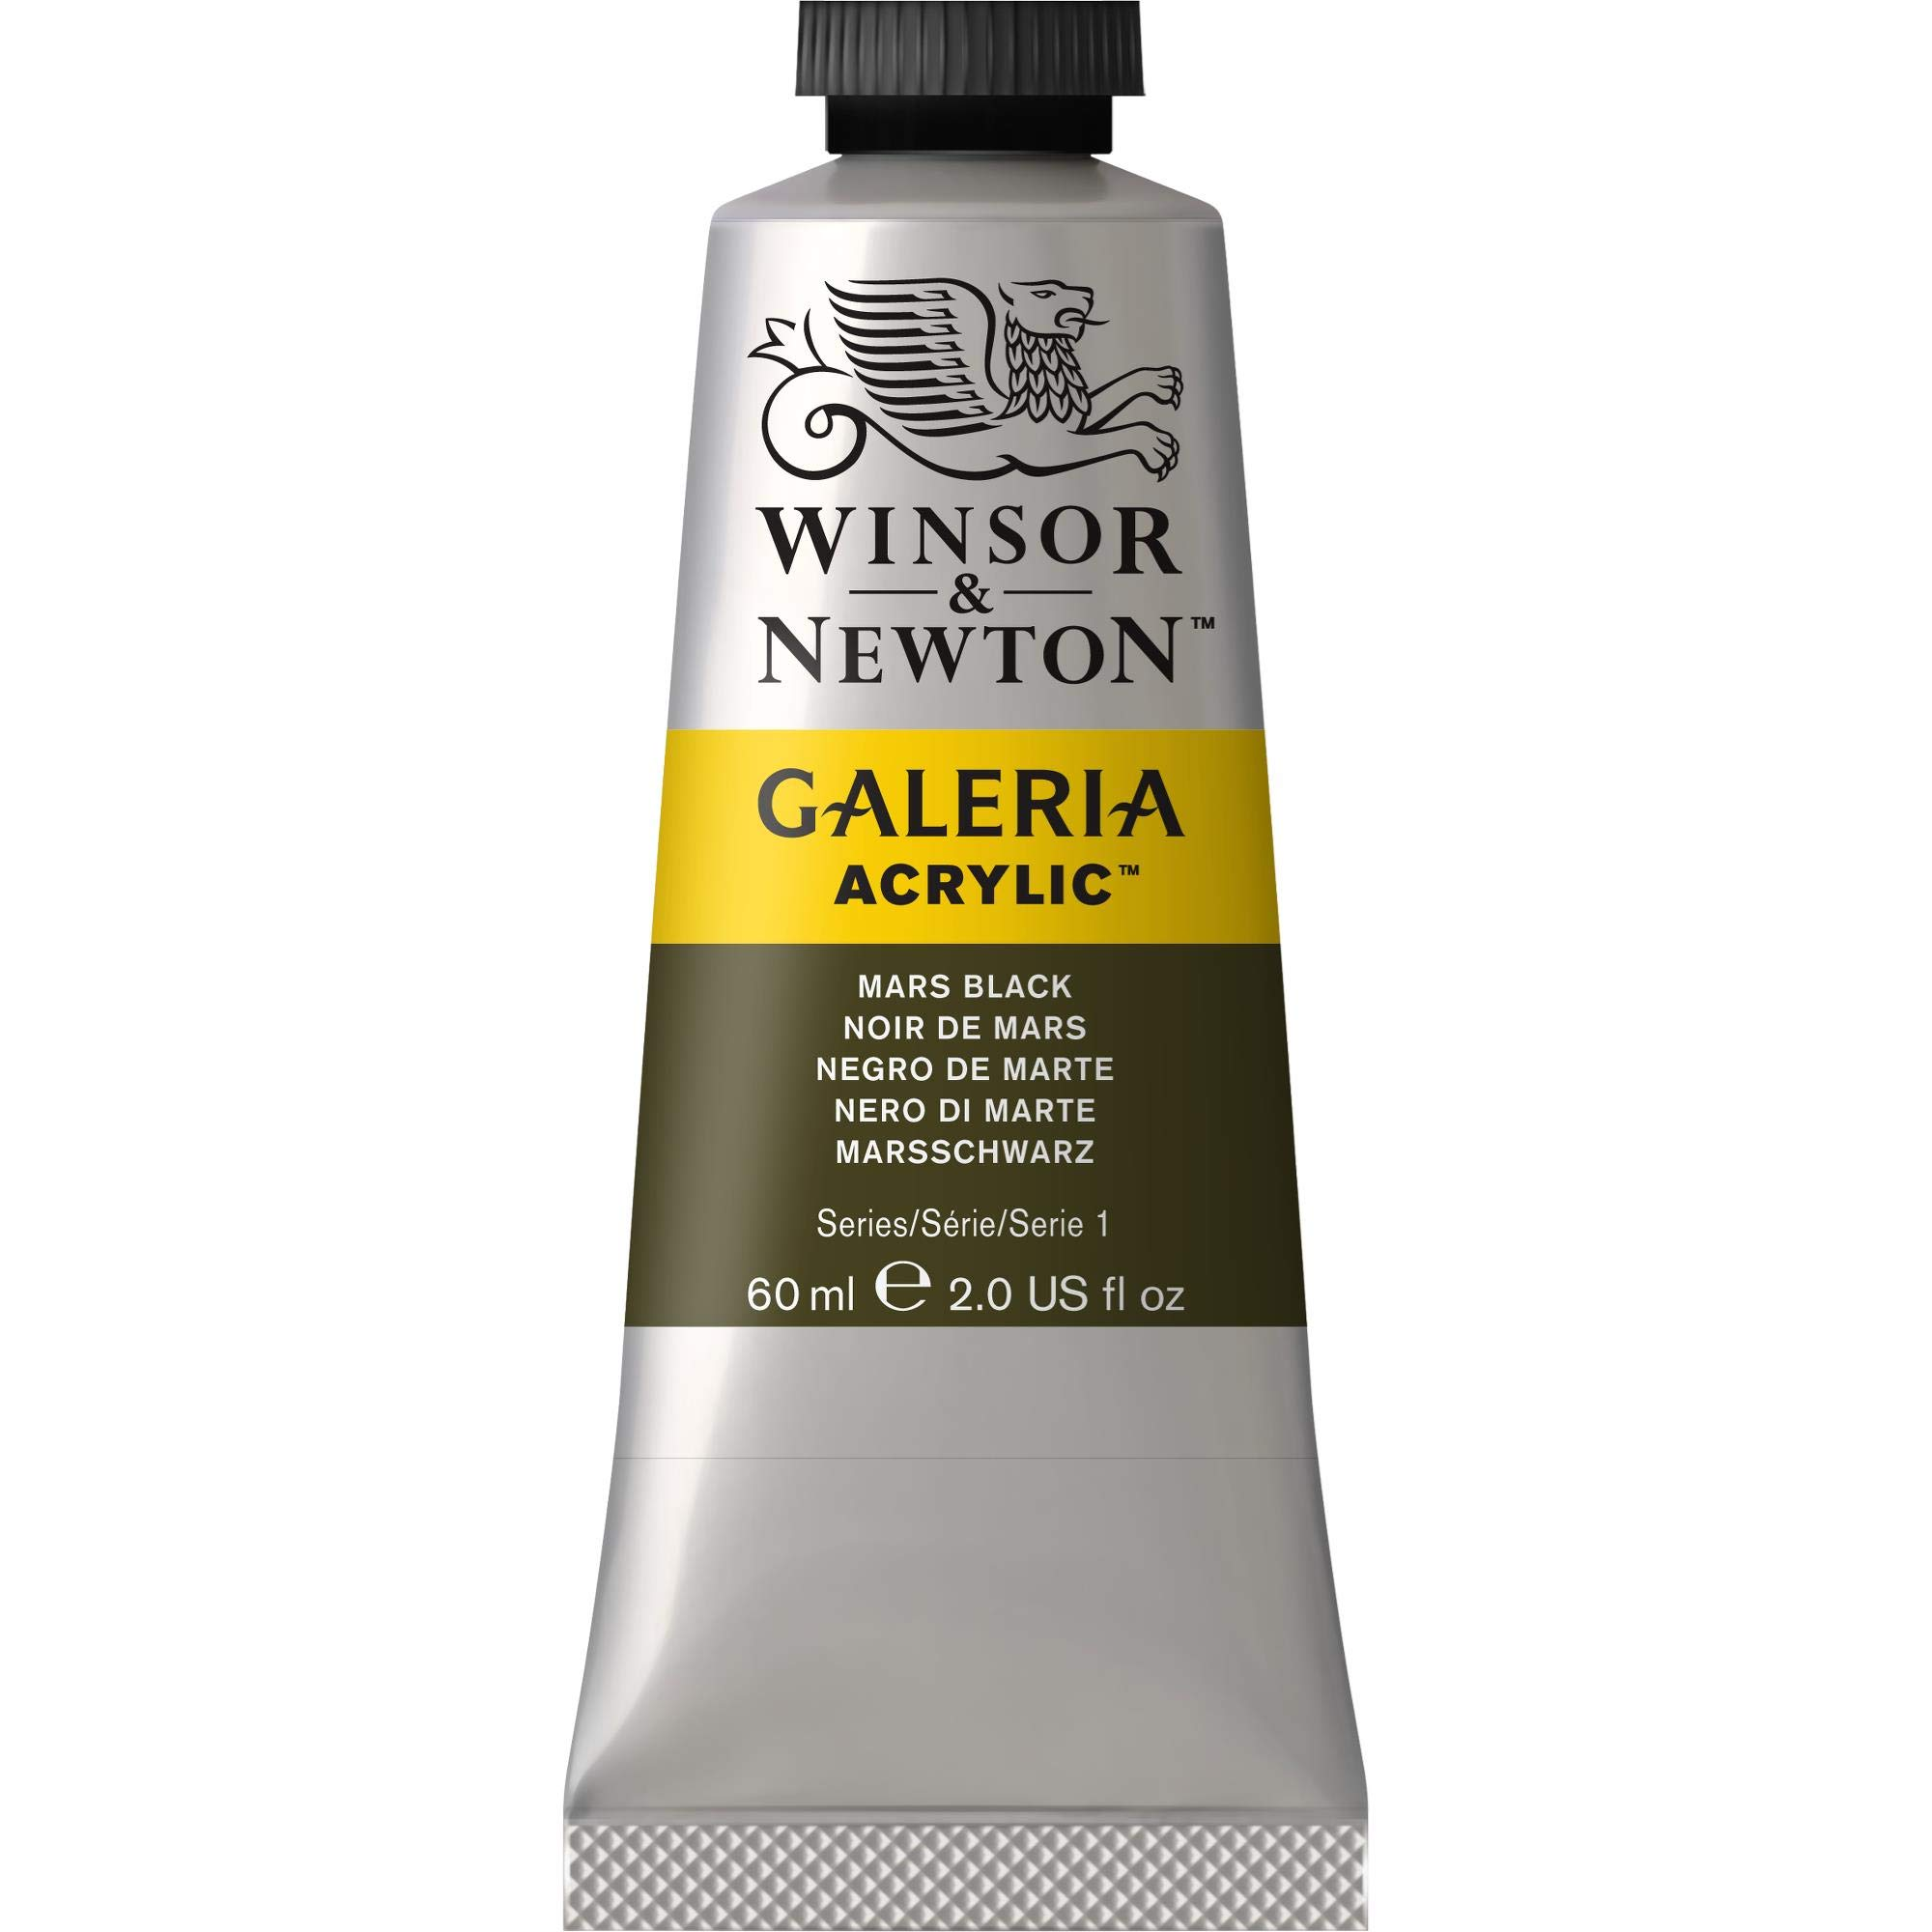 Winsor & Newton Galeria Acrylic Paint, 60ml Tube, Mars Black